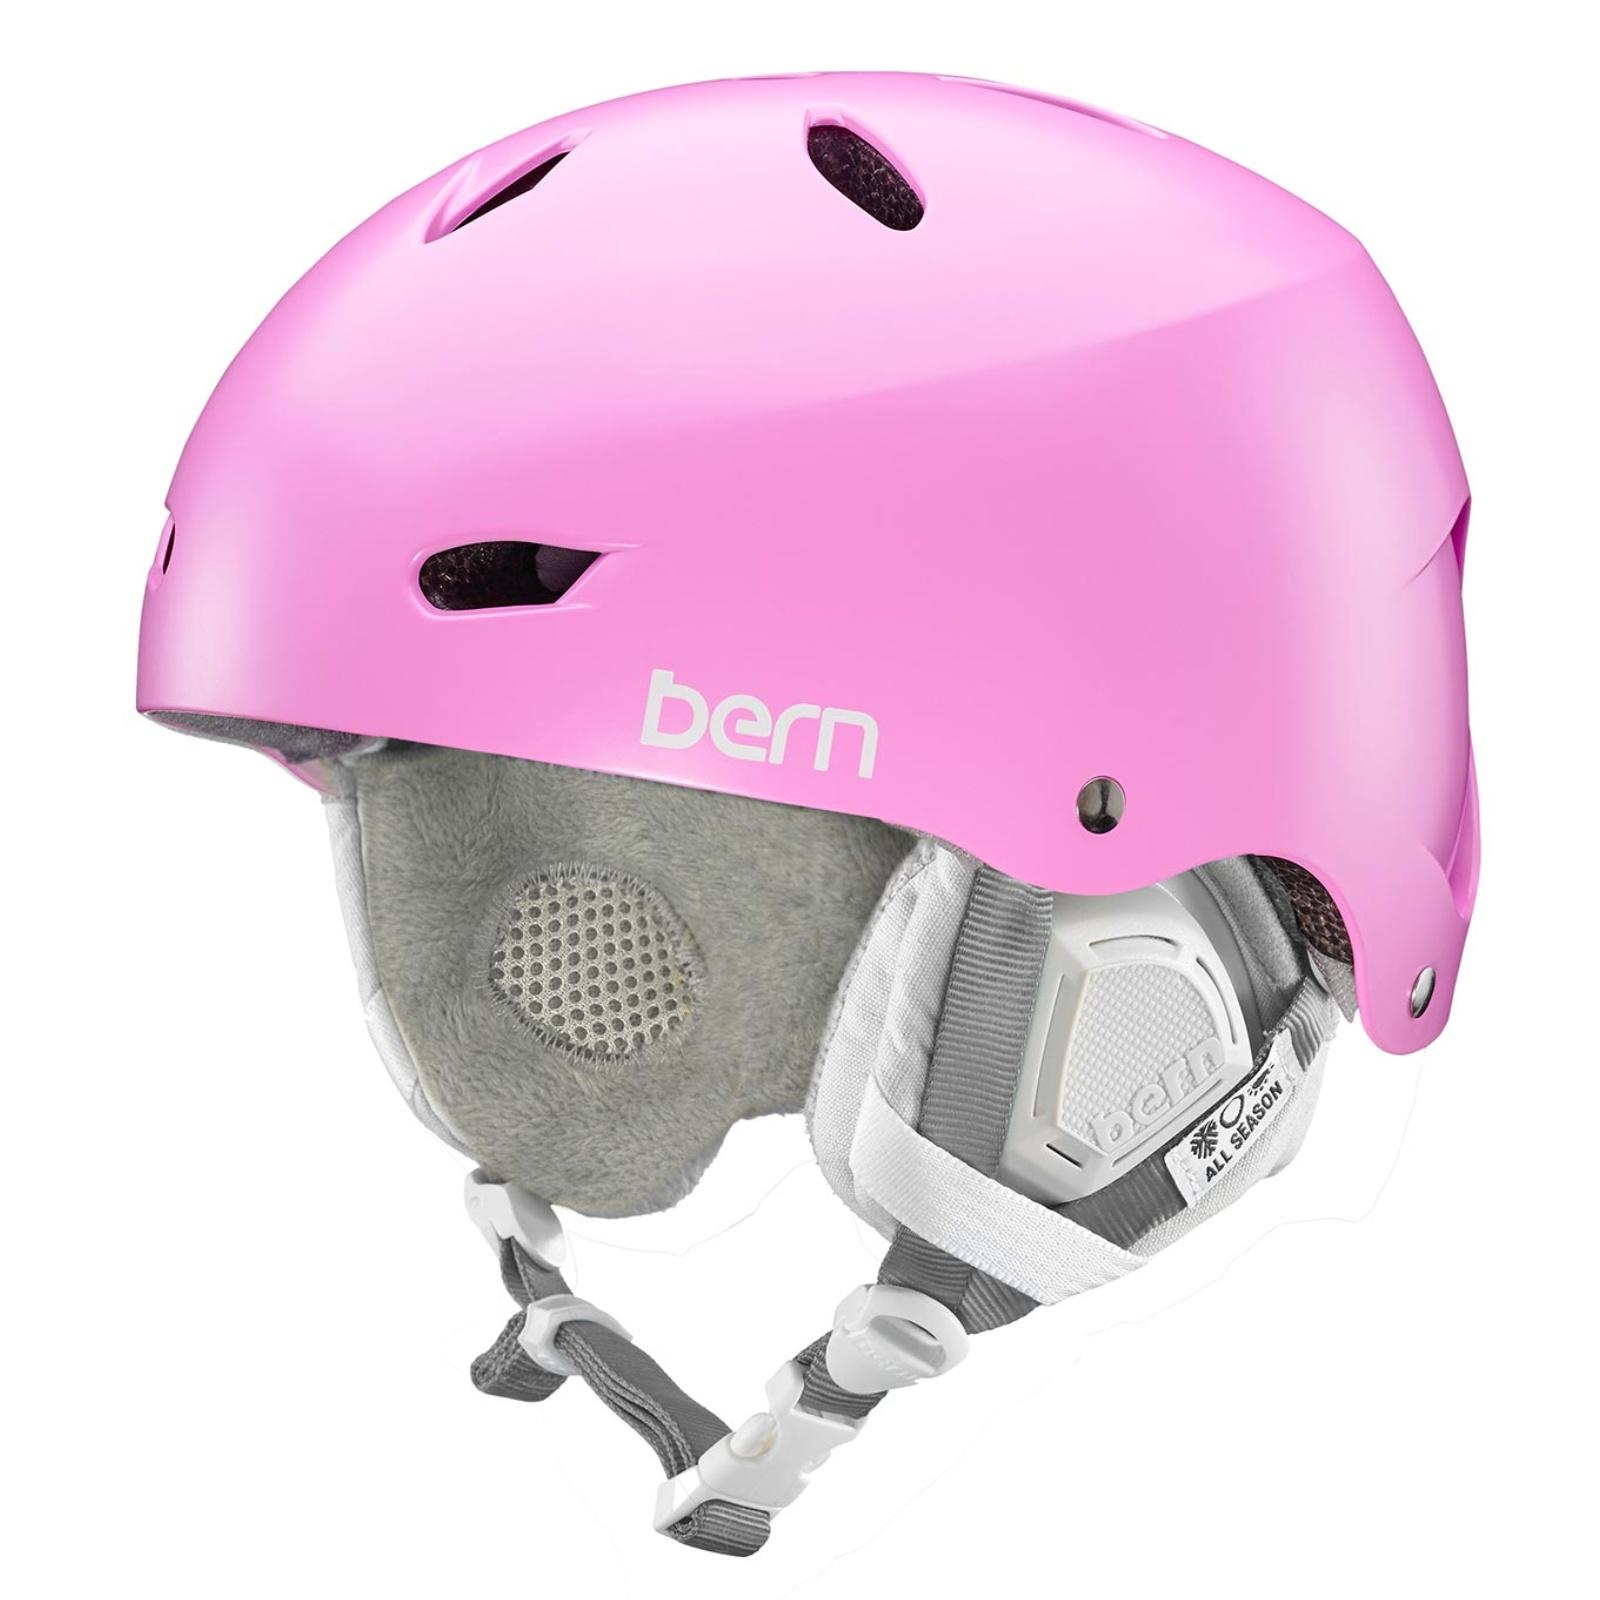 Helma BERN Brighton dámská růžová - vel. XS/S